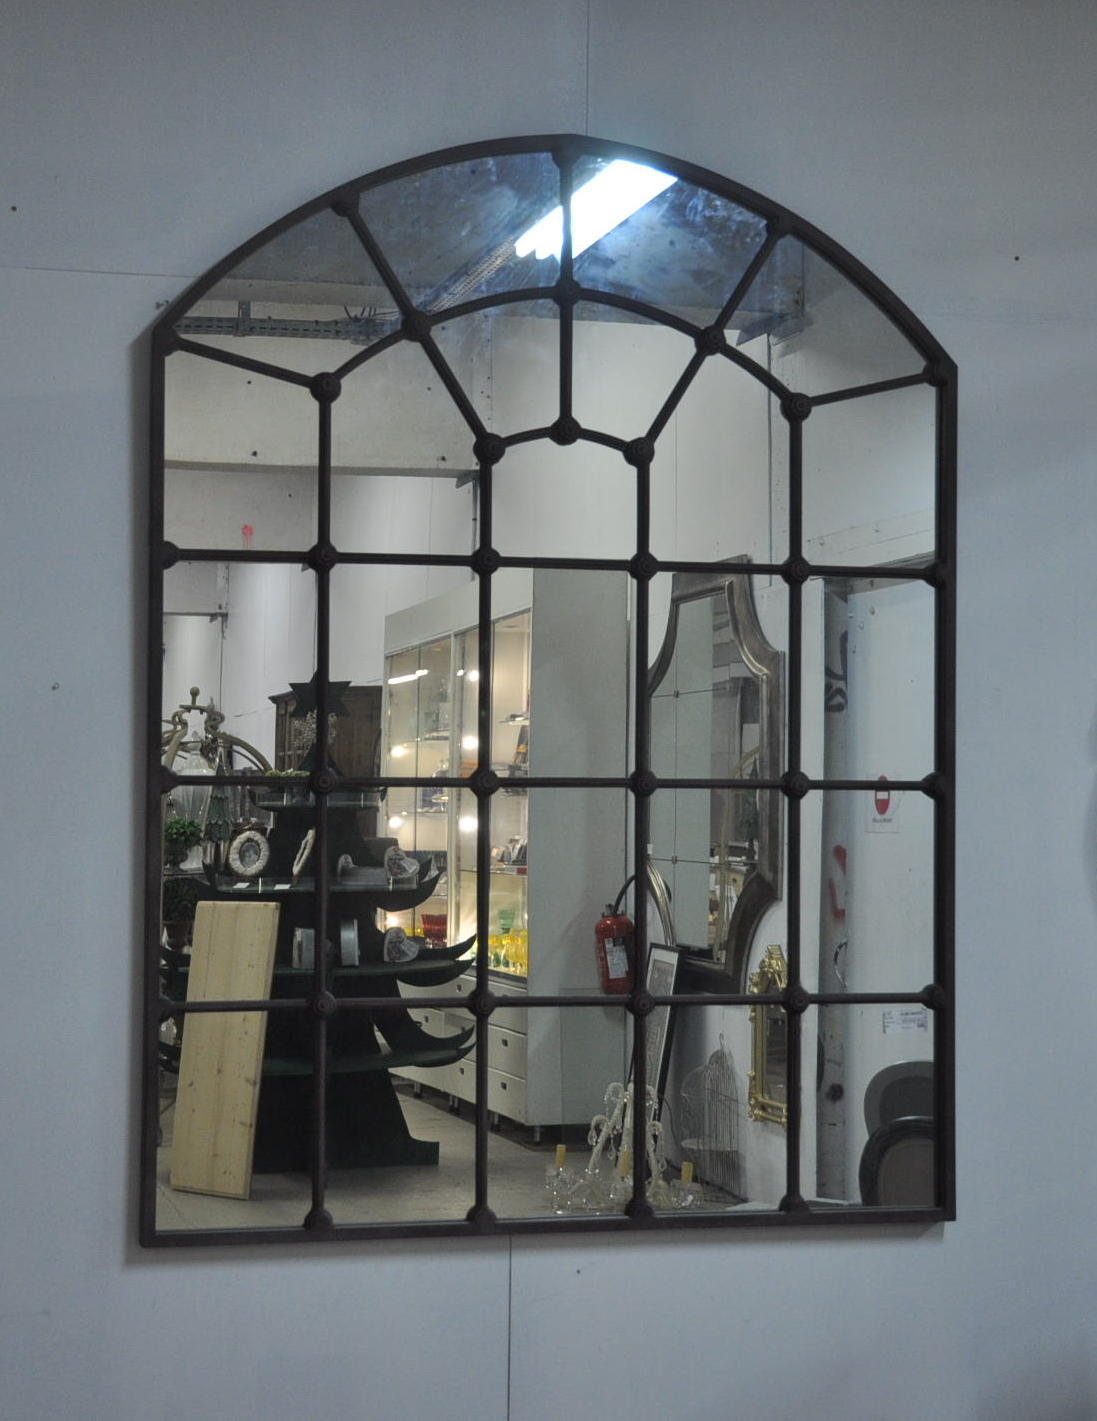 Grand miroir atelier en m tal de style industriel 140x180 cm demeure et jardin for Grand miroir mural industriel